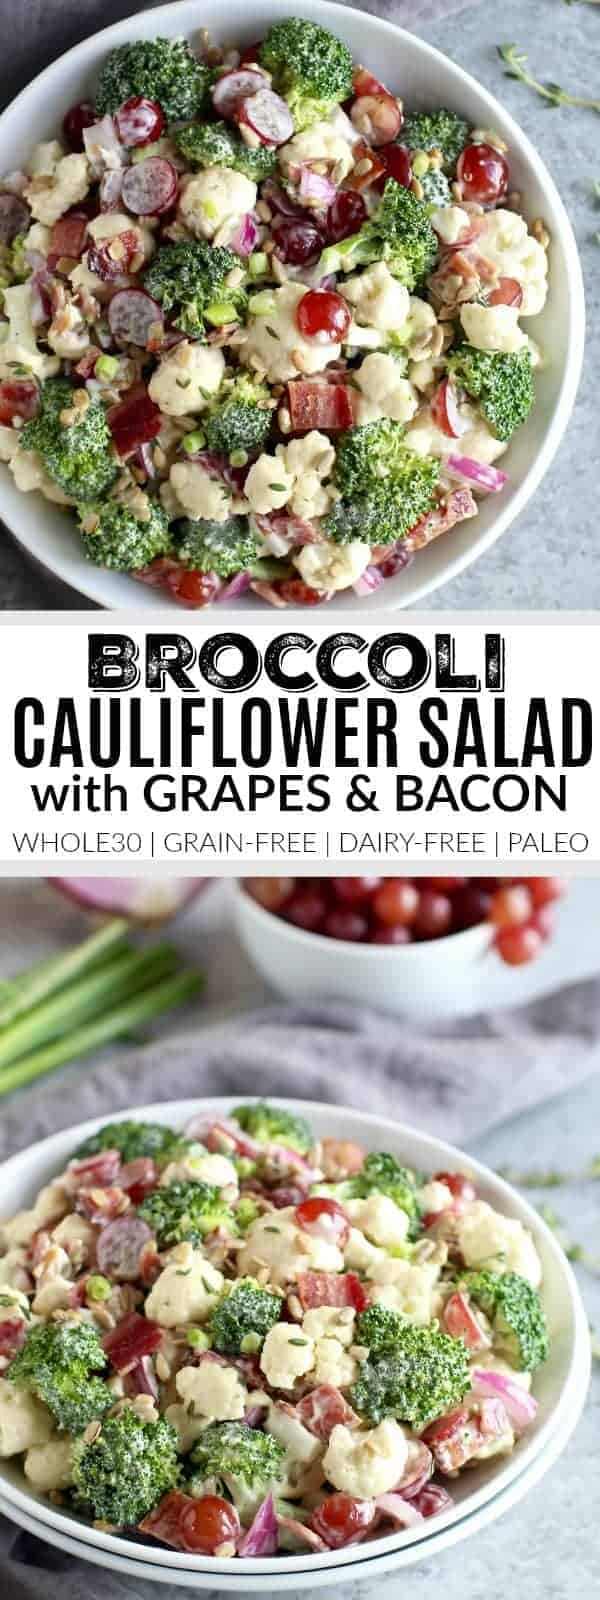 Broccoli-Cauliflower Salad with Bacon pin